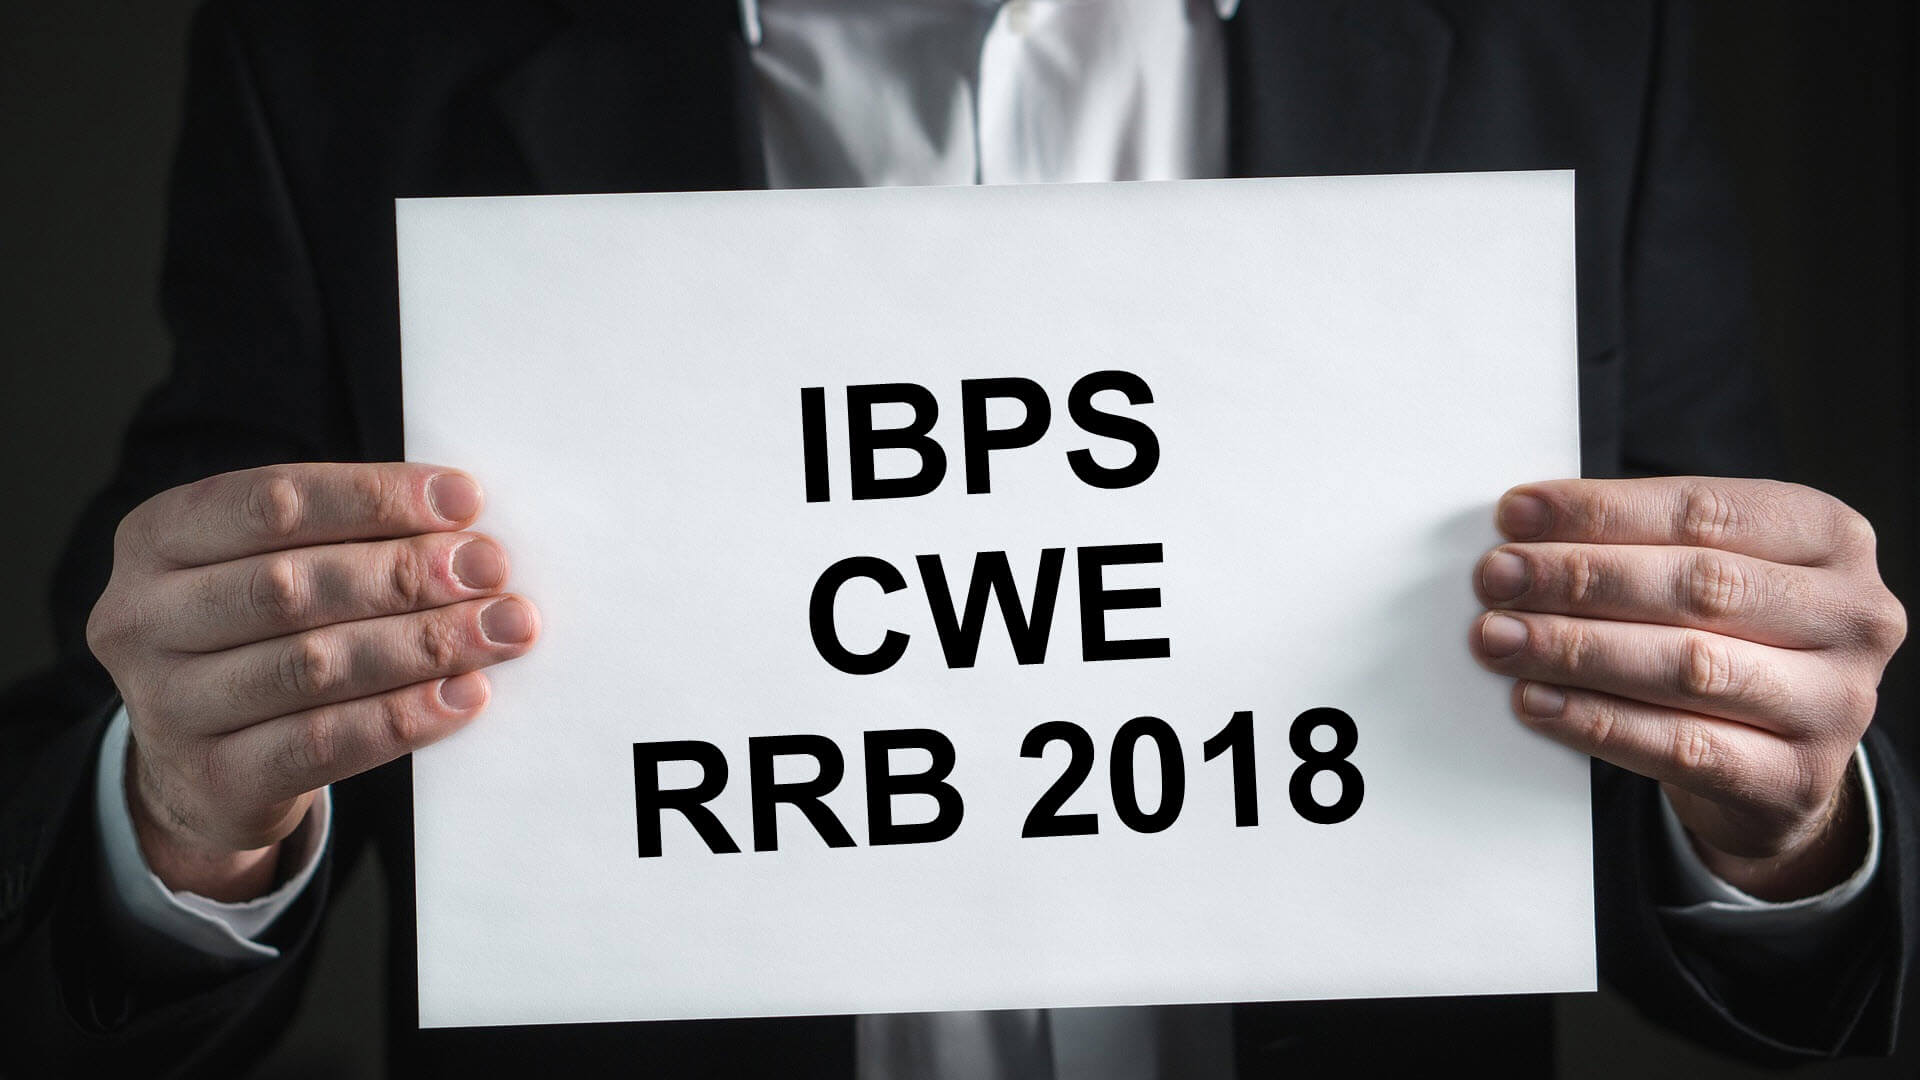 IBPS CWE RRB 2018